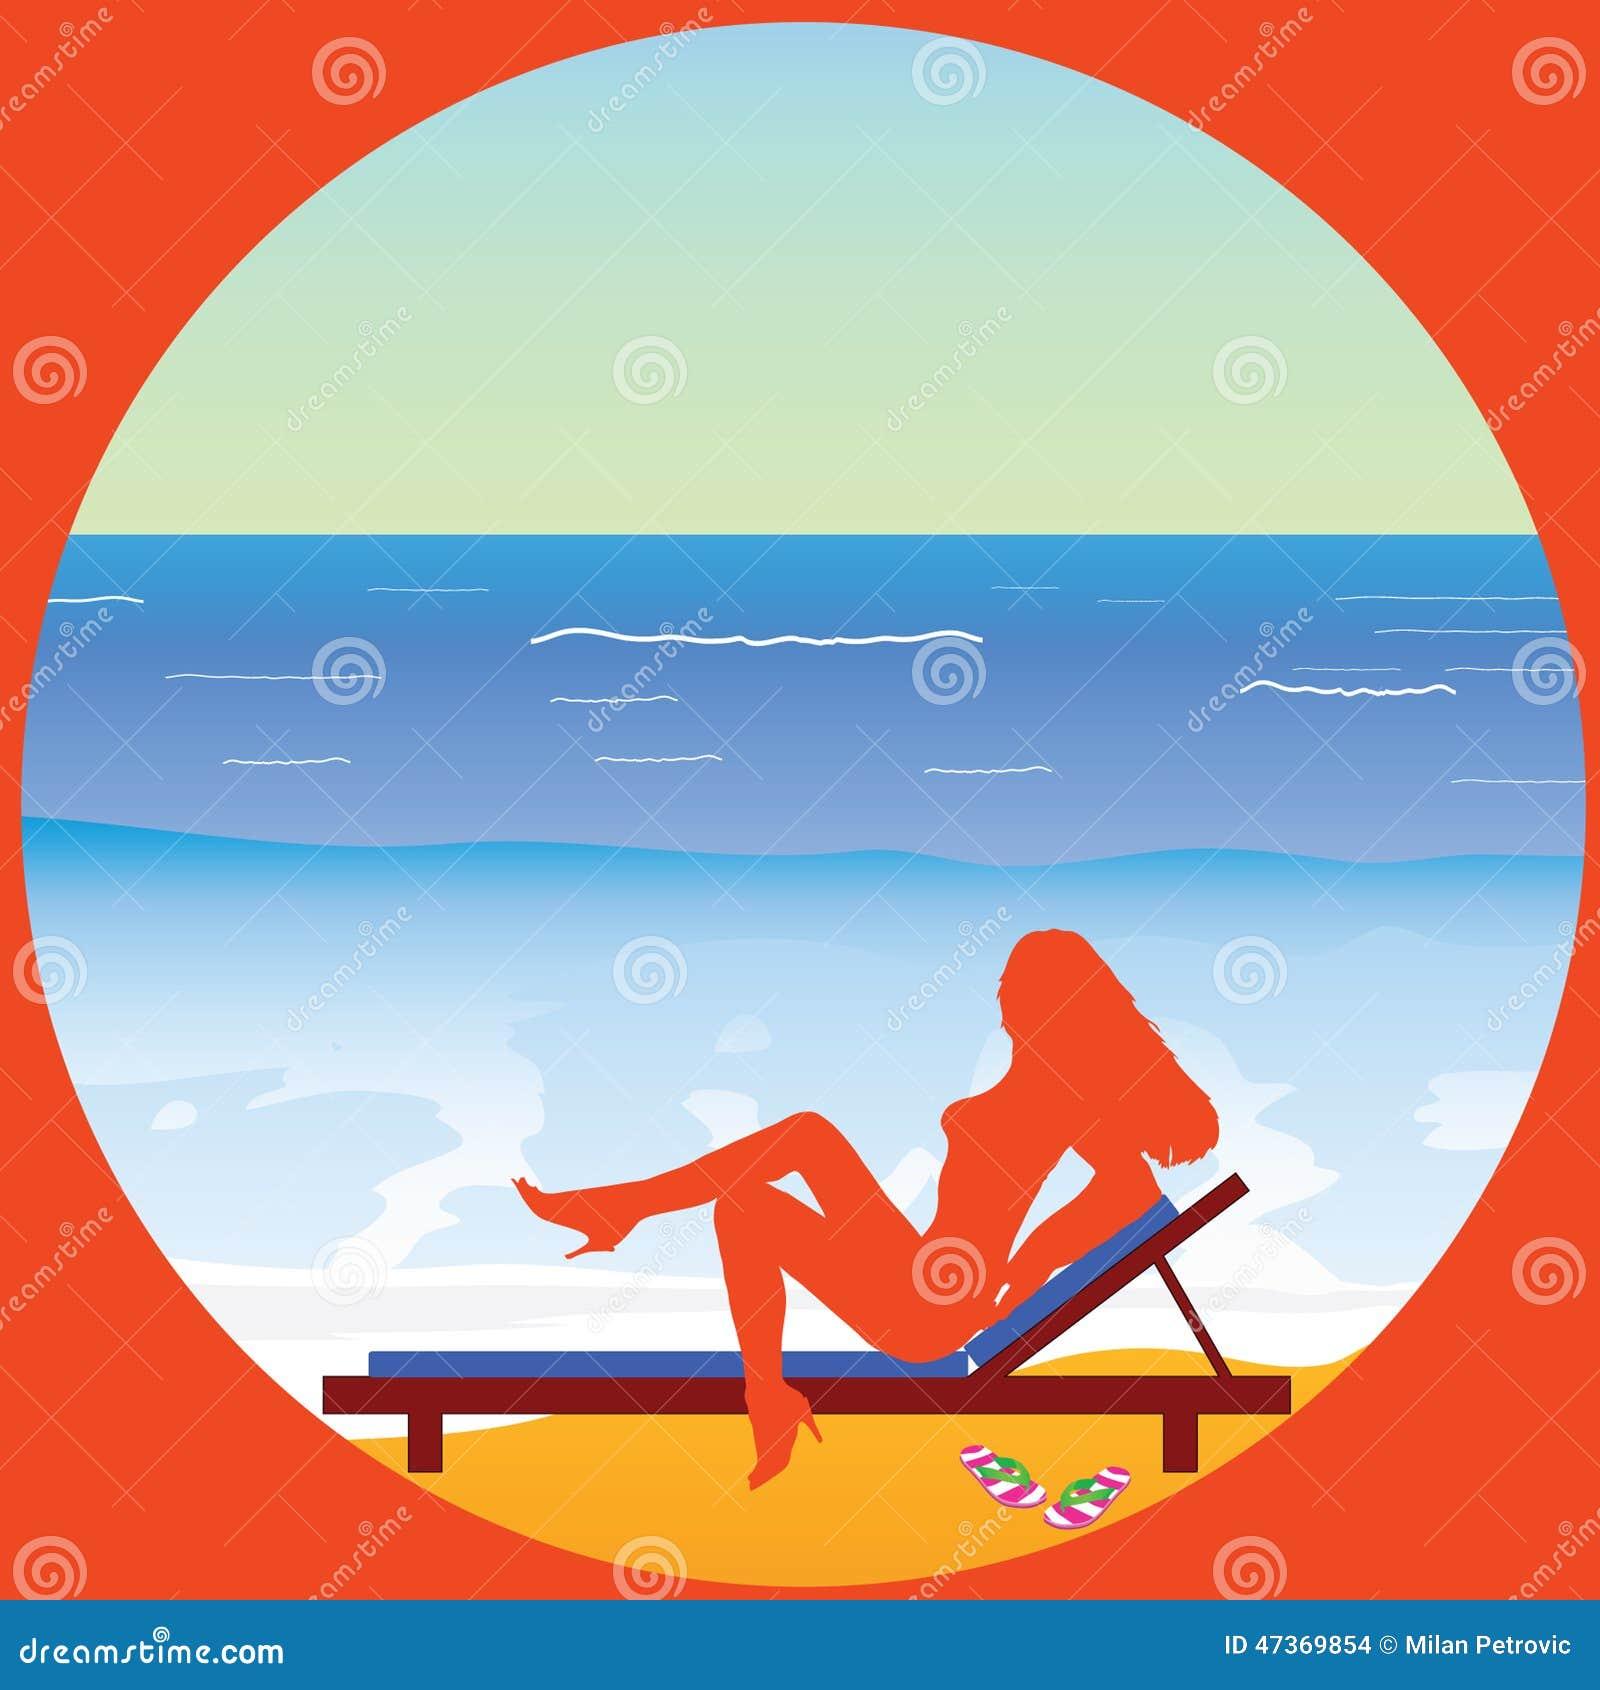 Woman Enjoying At Beach Stock Image Image Of Pleasure: Girl Enjoy On The Paradise Beach Vector Stock Vector